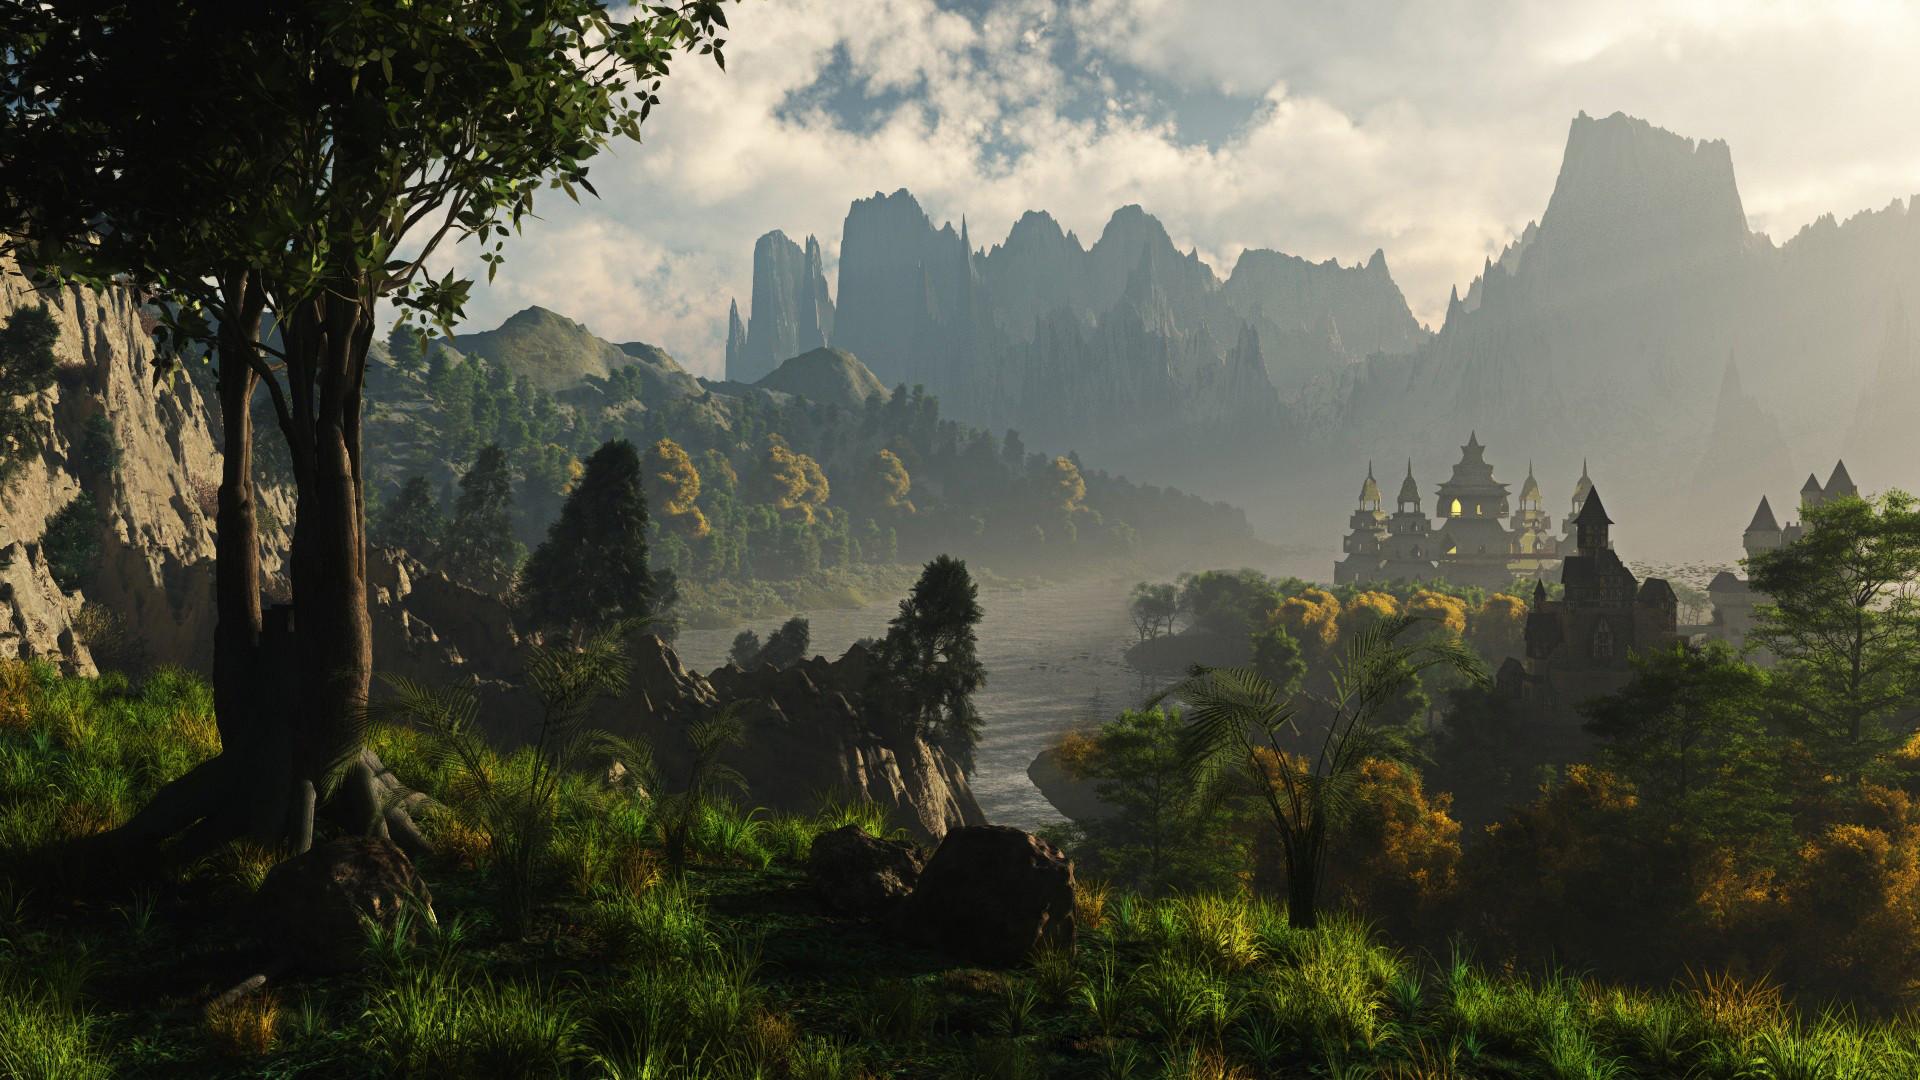 Fantasy Landscape Wallpaper 77 Pictures